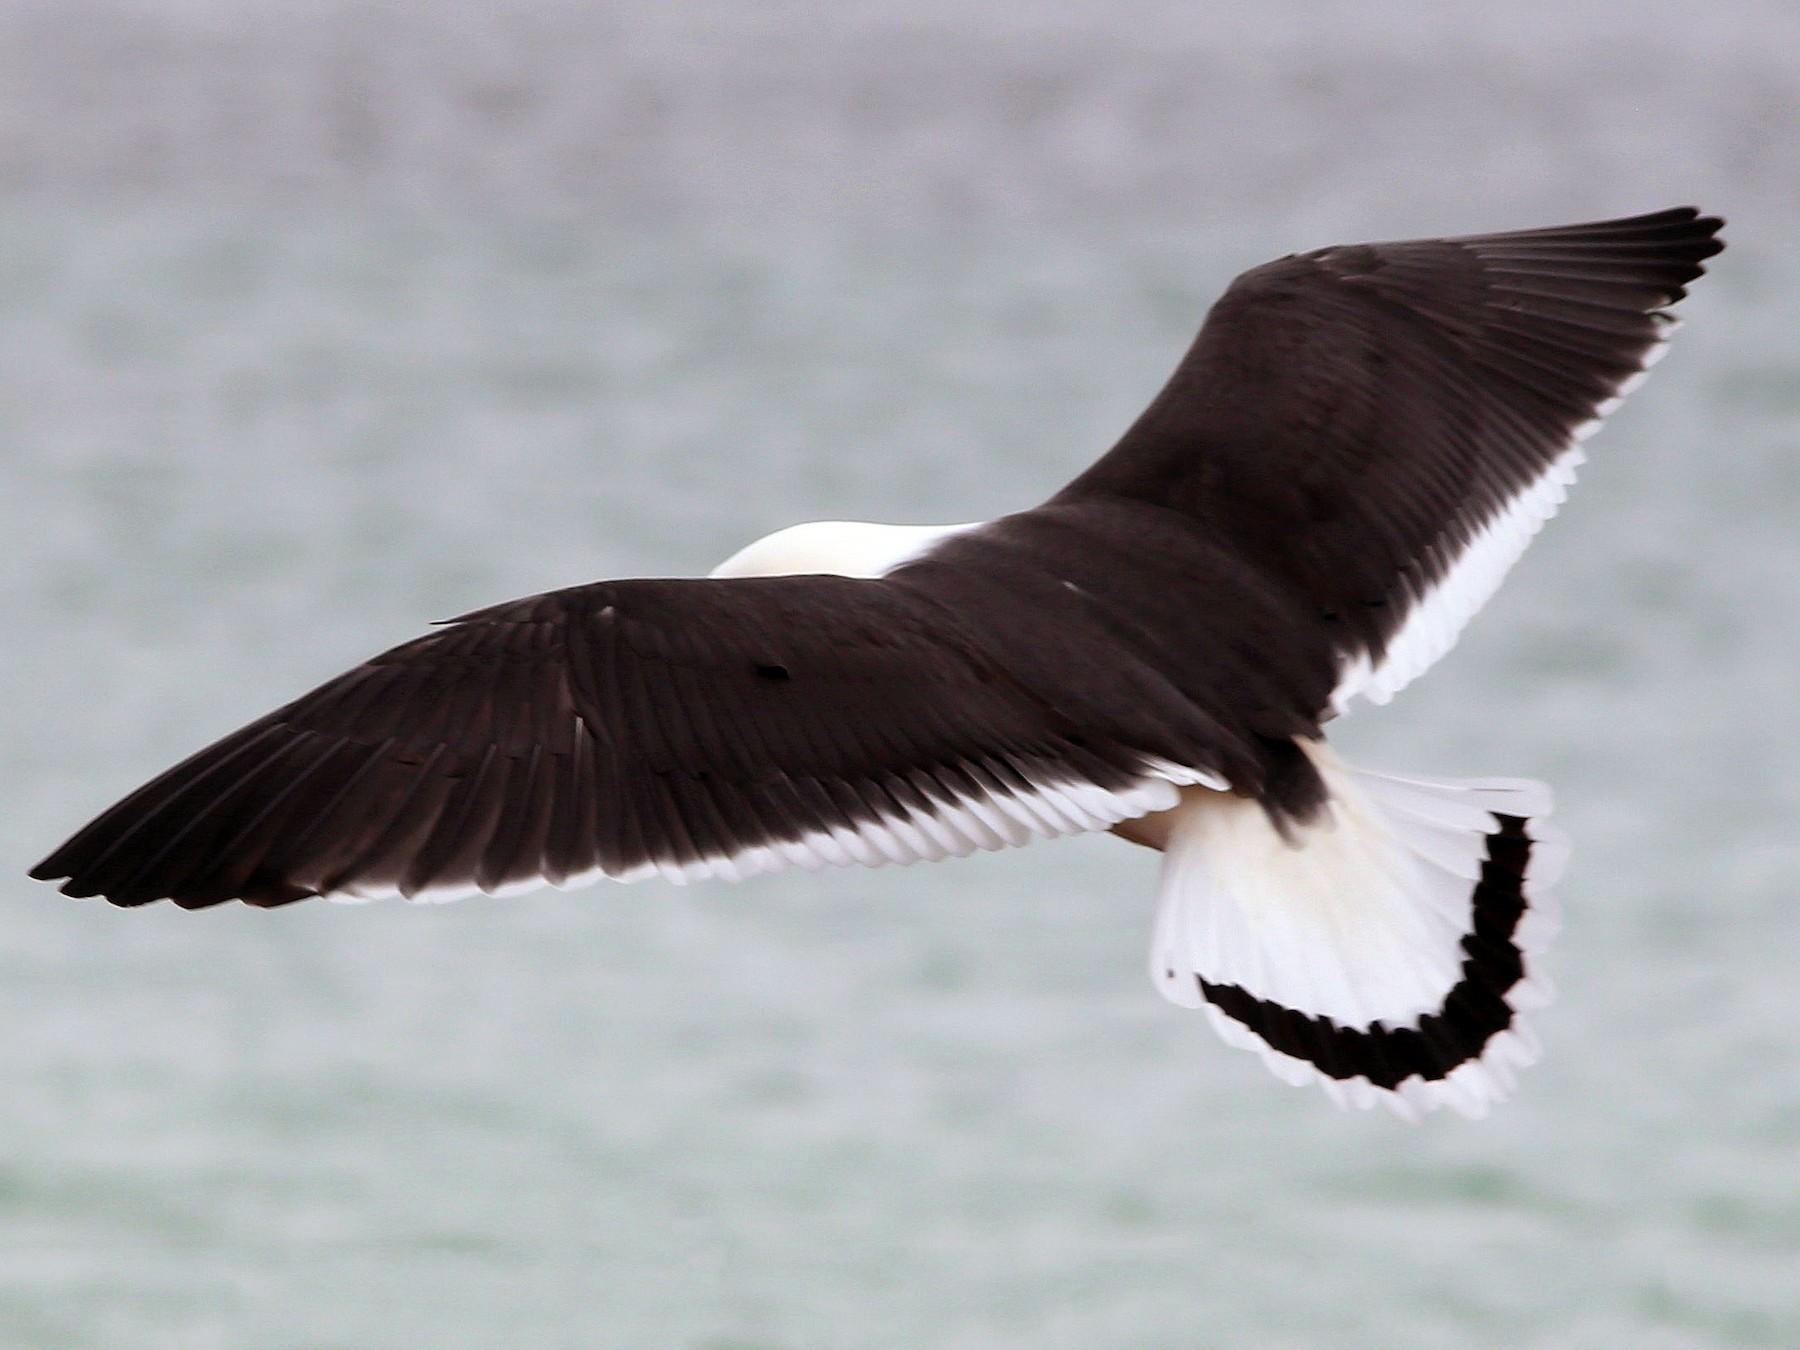 Pacific Gull - Rohan van Twest